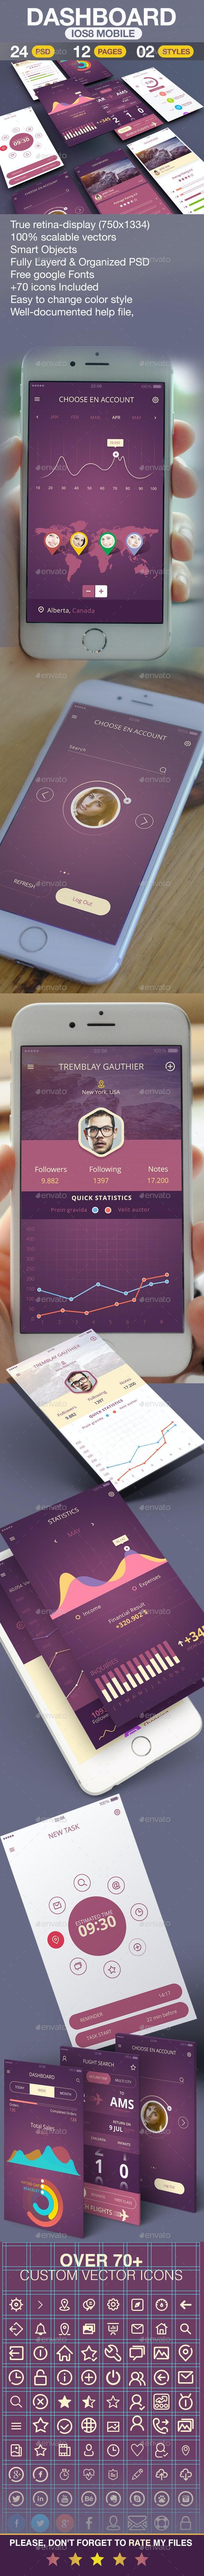 Dashboard UI Kit Mobile - User Interfaces Web Elements